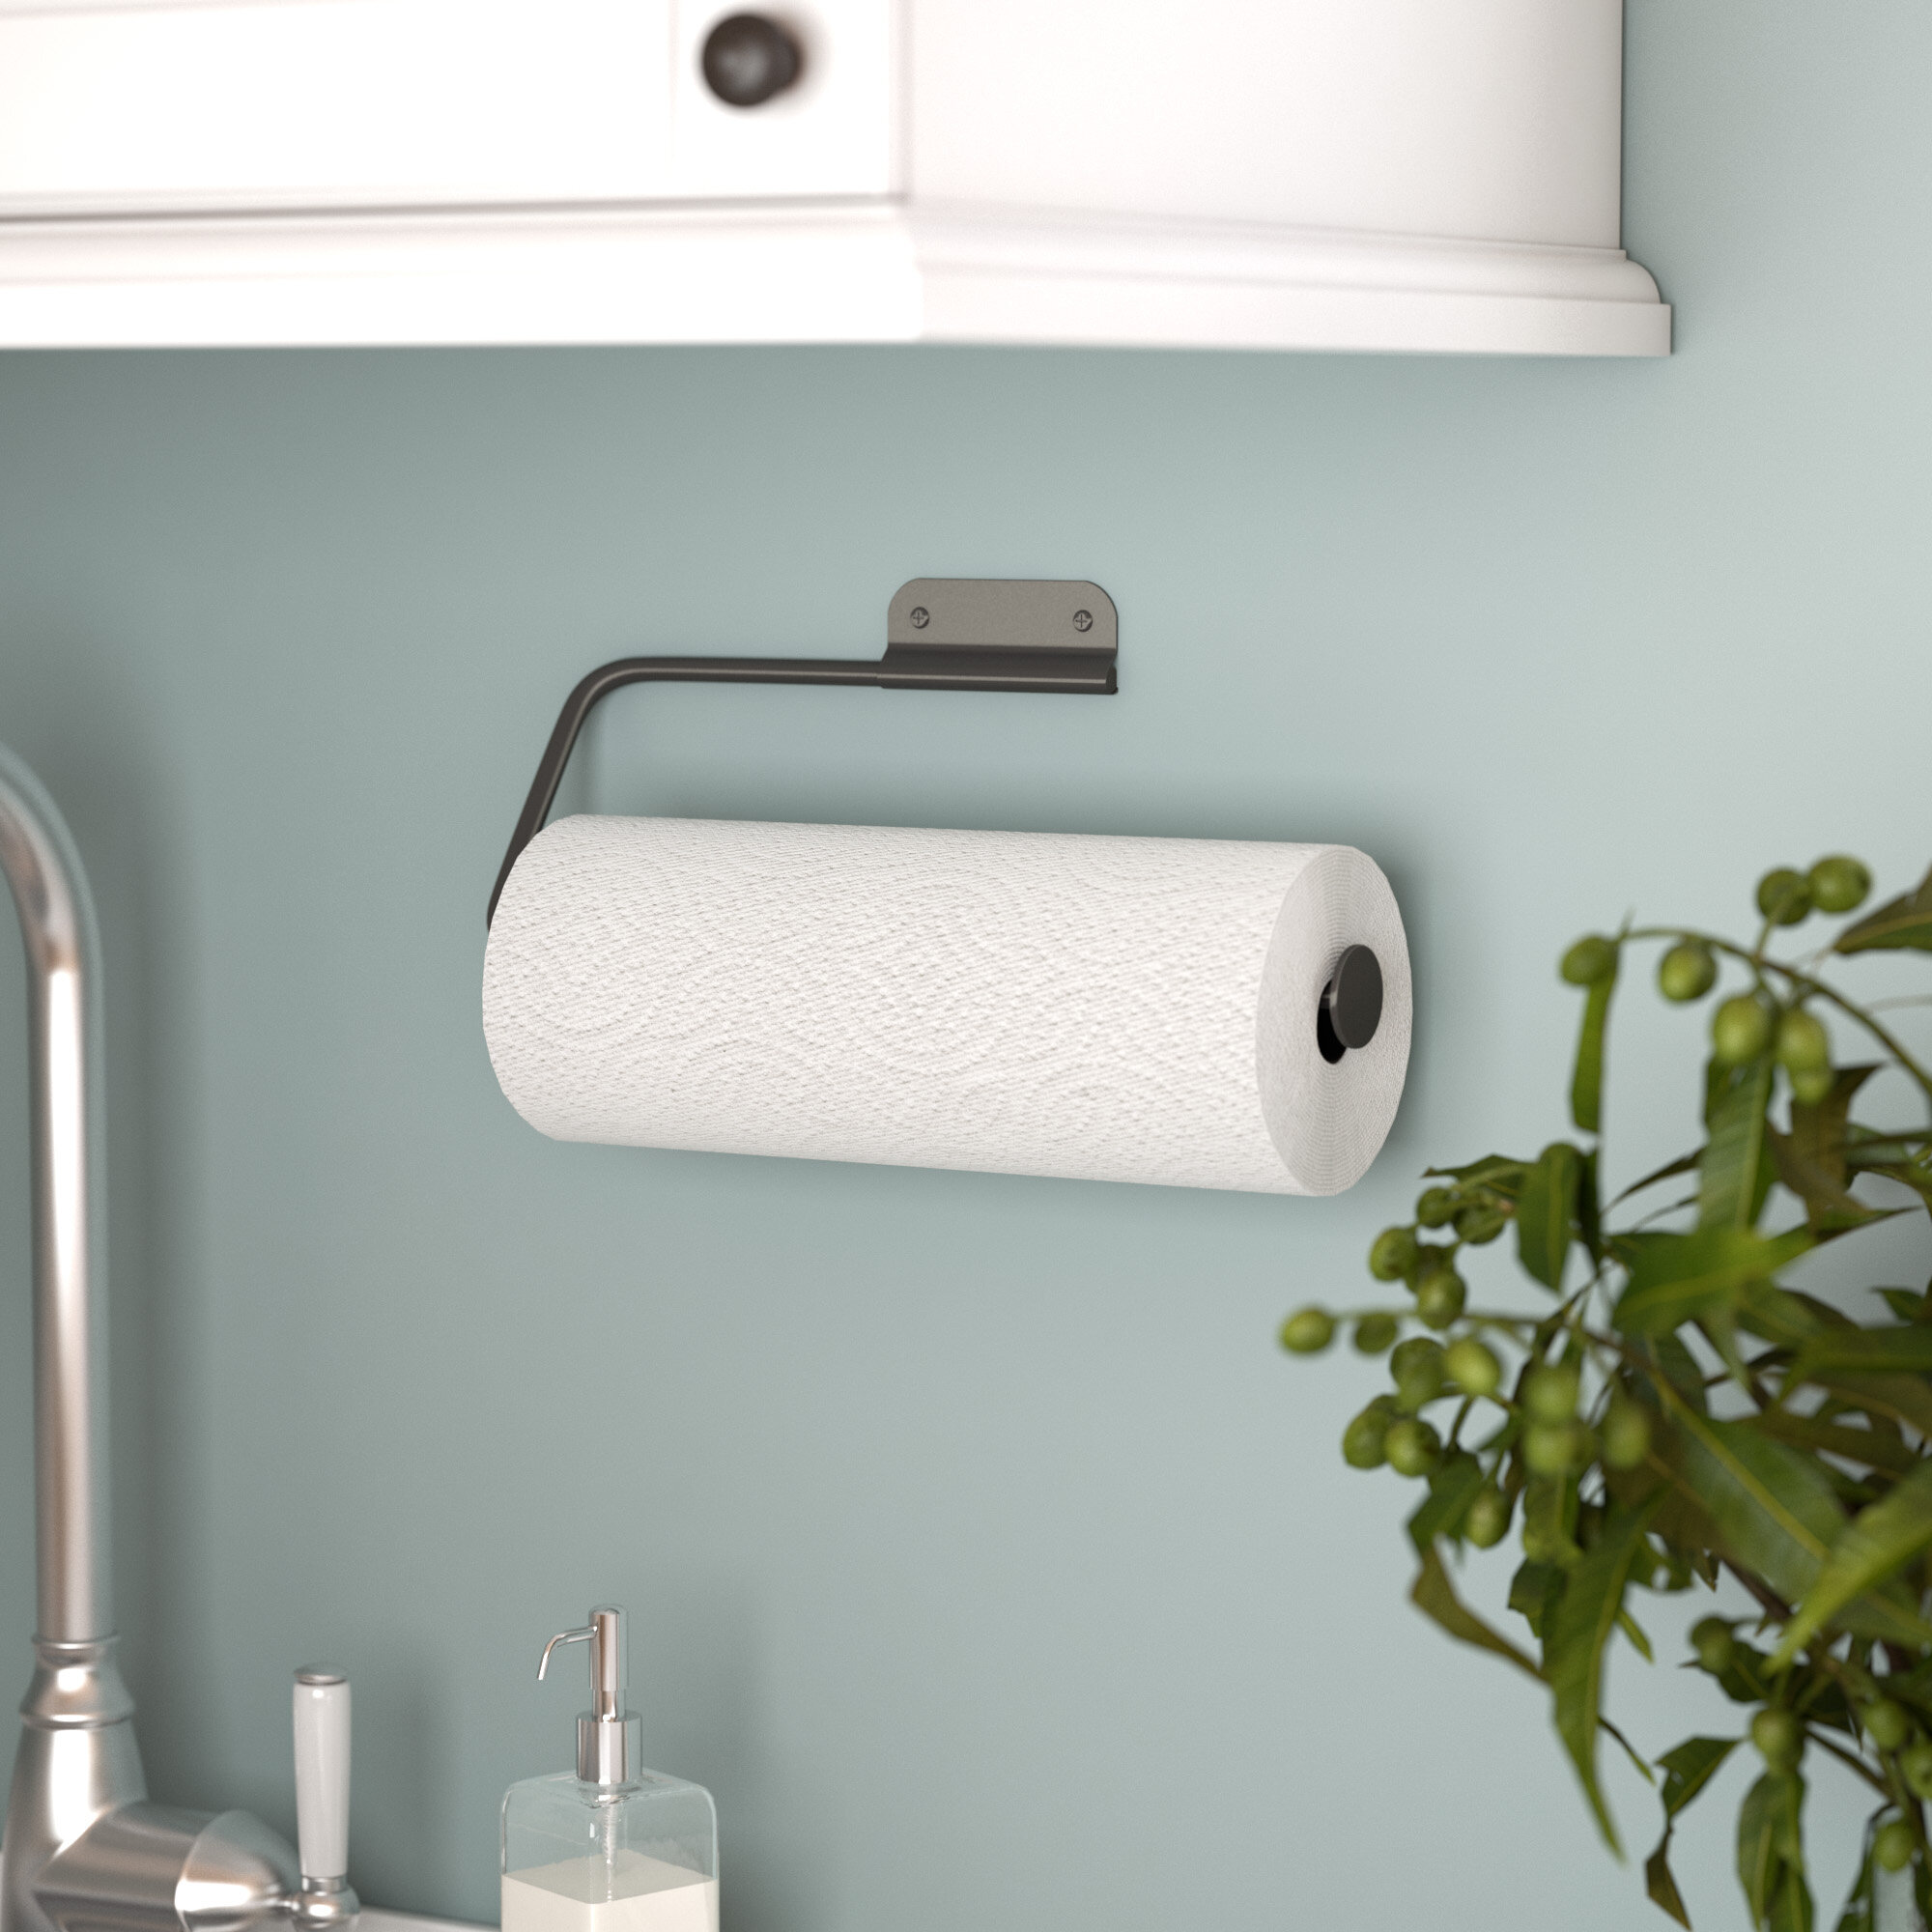 Mint Pantry Wall Mount Paper Towel Holder & Reviews | Wayfair